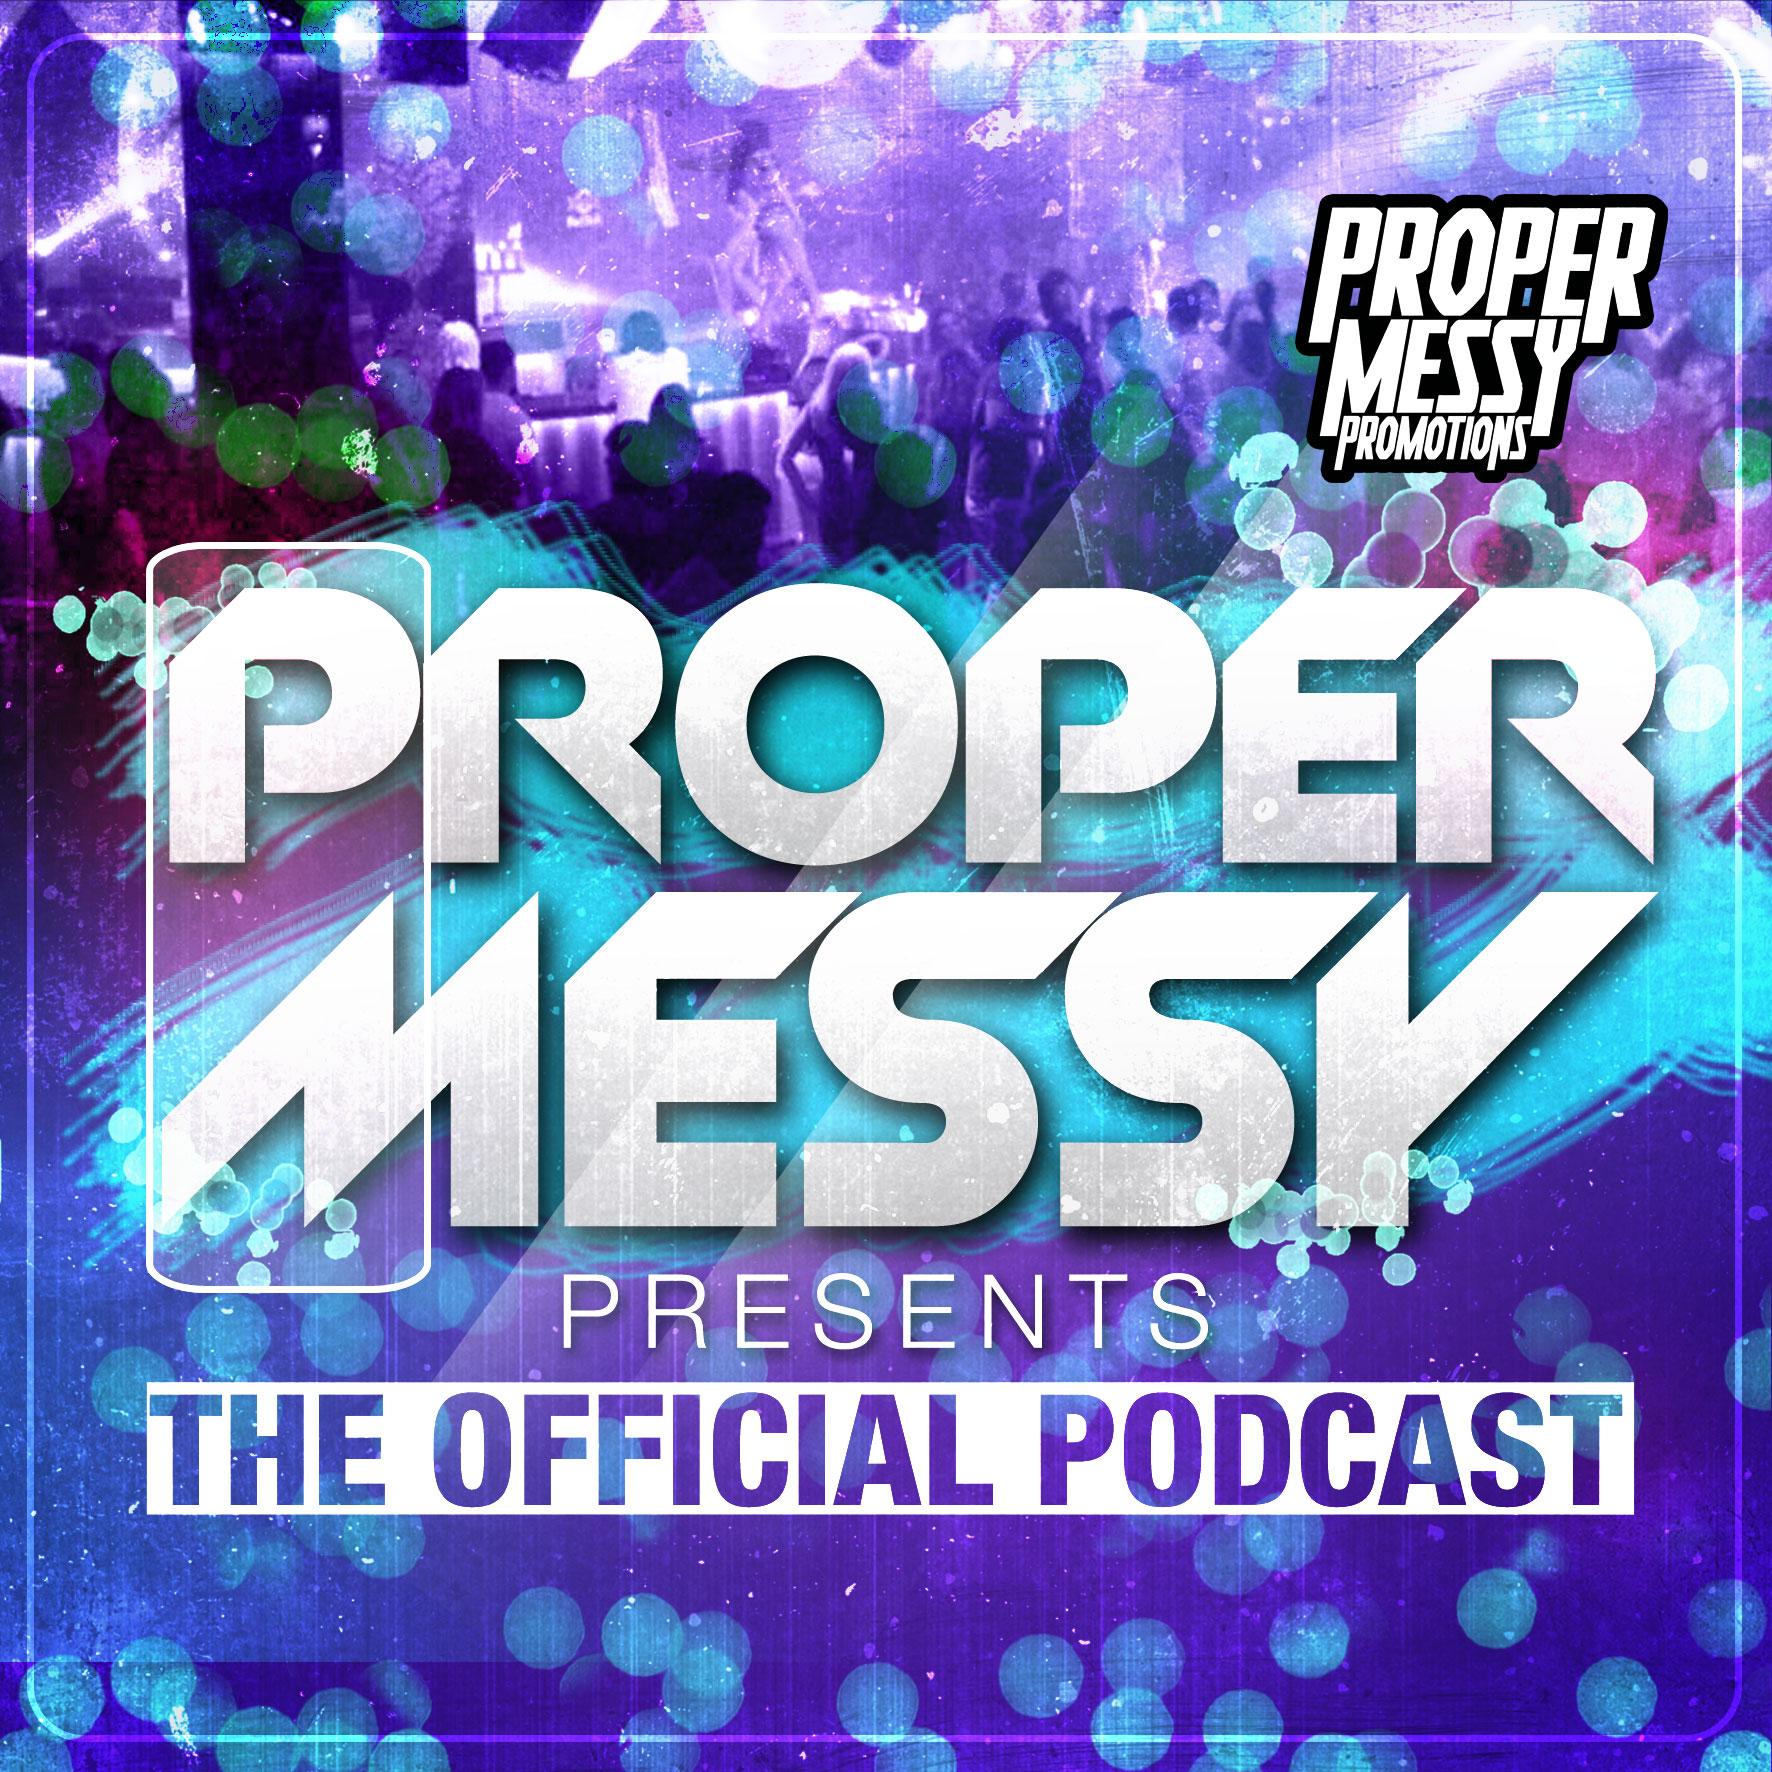 Proper Messy Presents